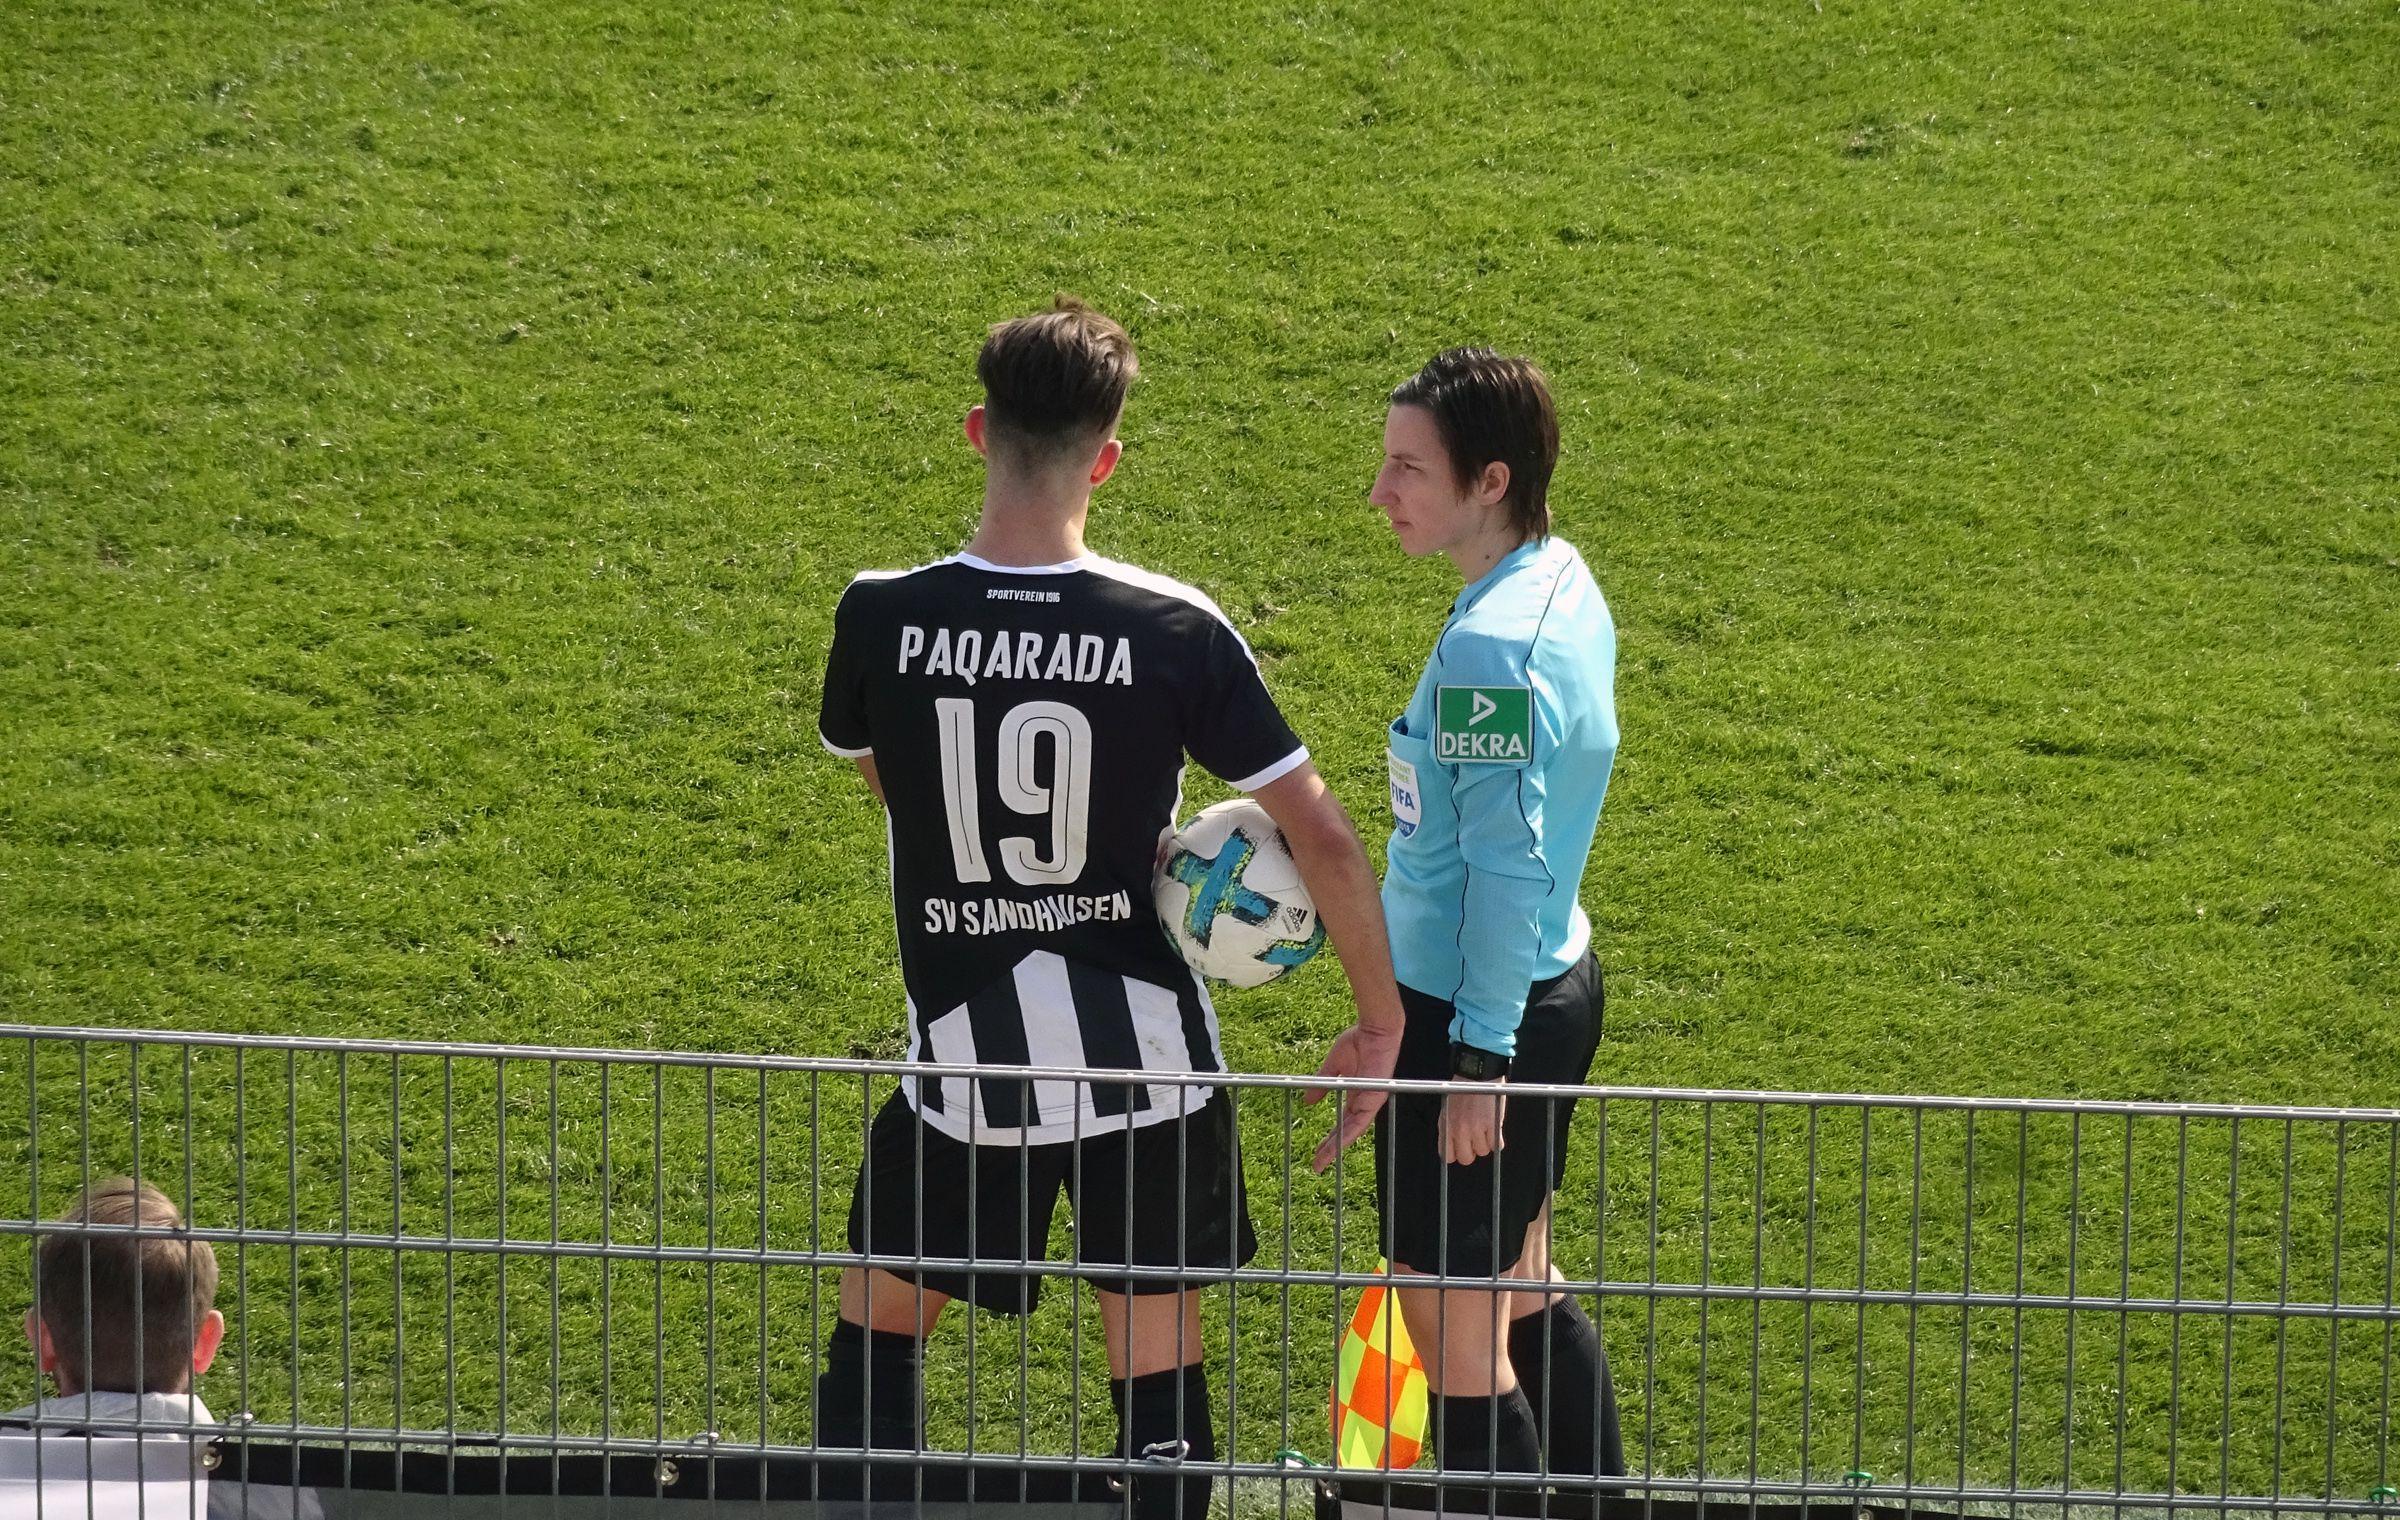 Leart Paqarada plaudert mit Schiedsrichterassistentin Katrin Rafalski…